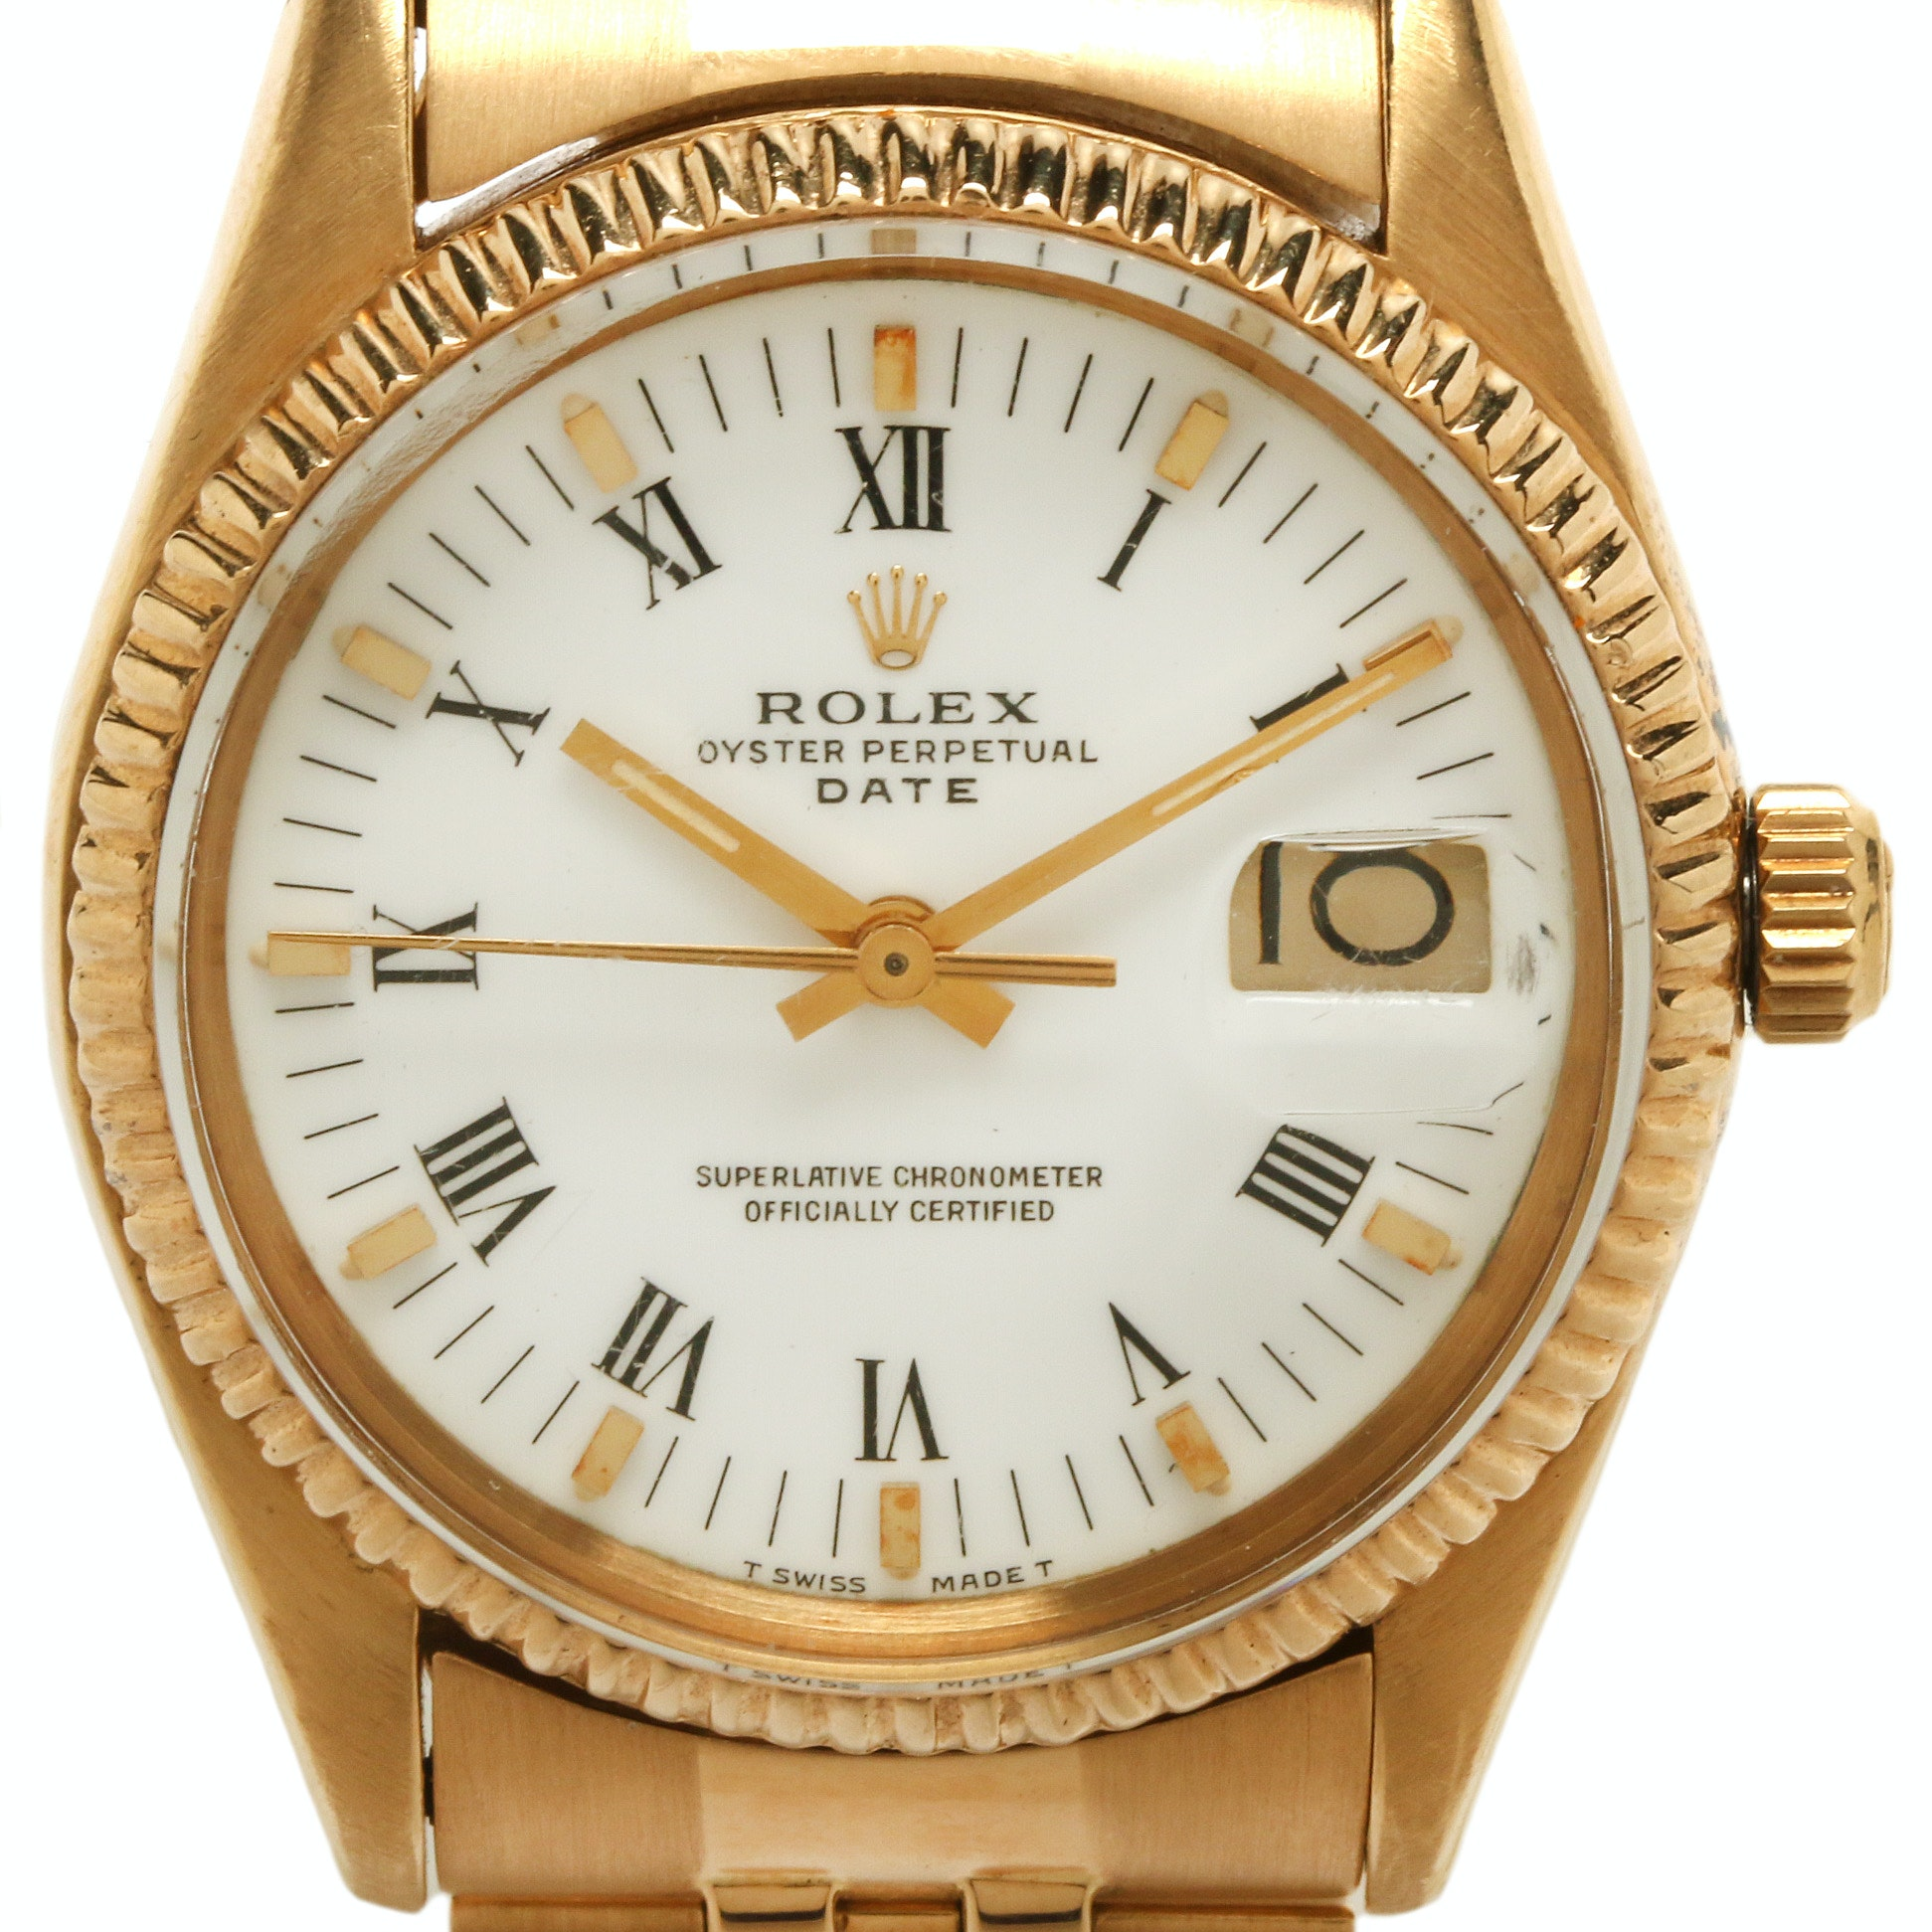 Rolex Date 18K Yellow Gold Wristwatch, 1983